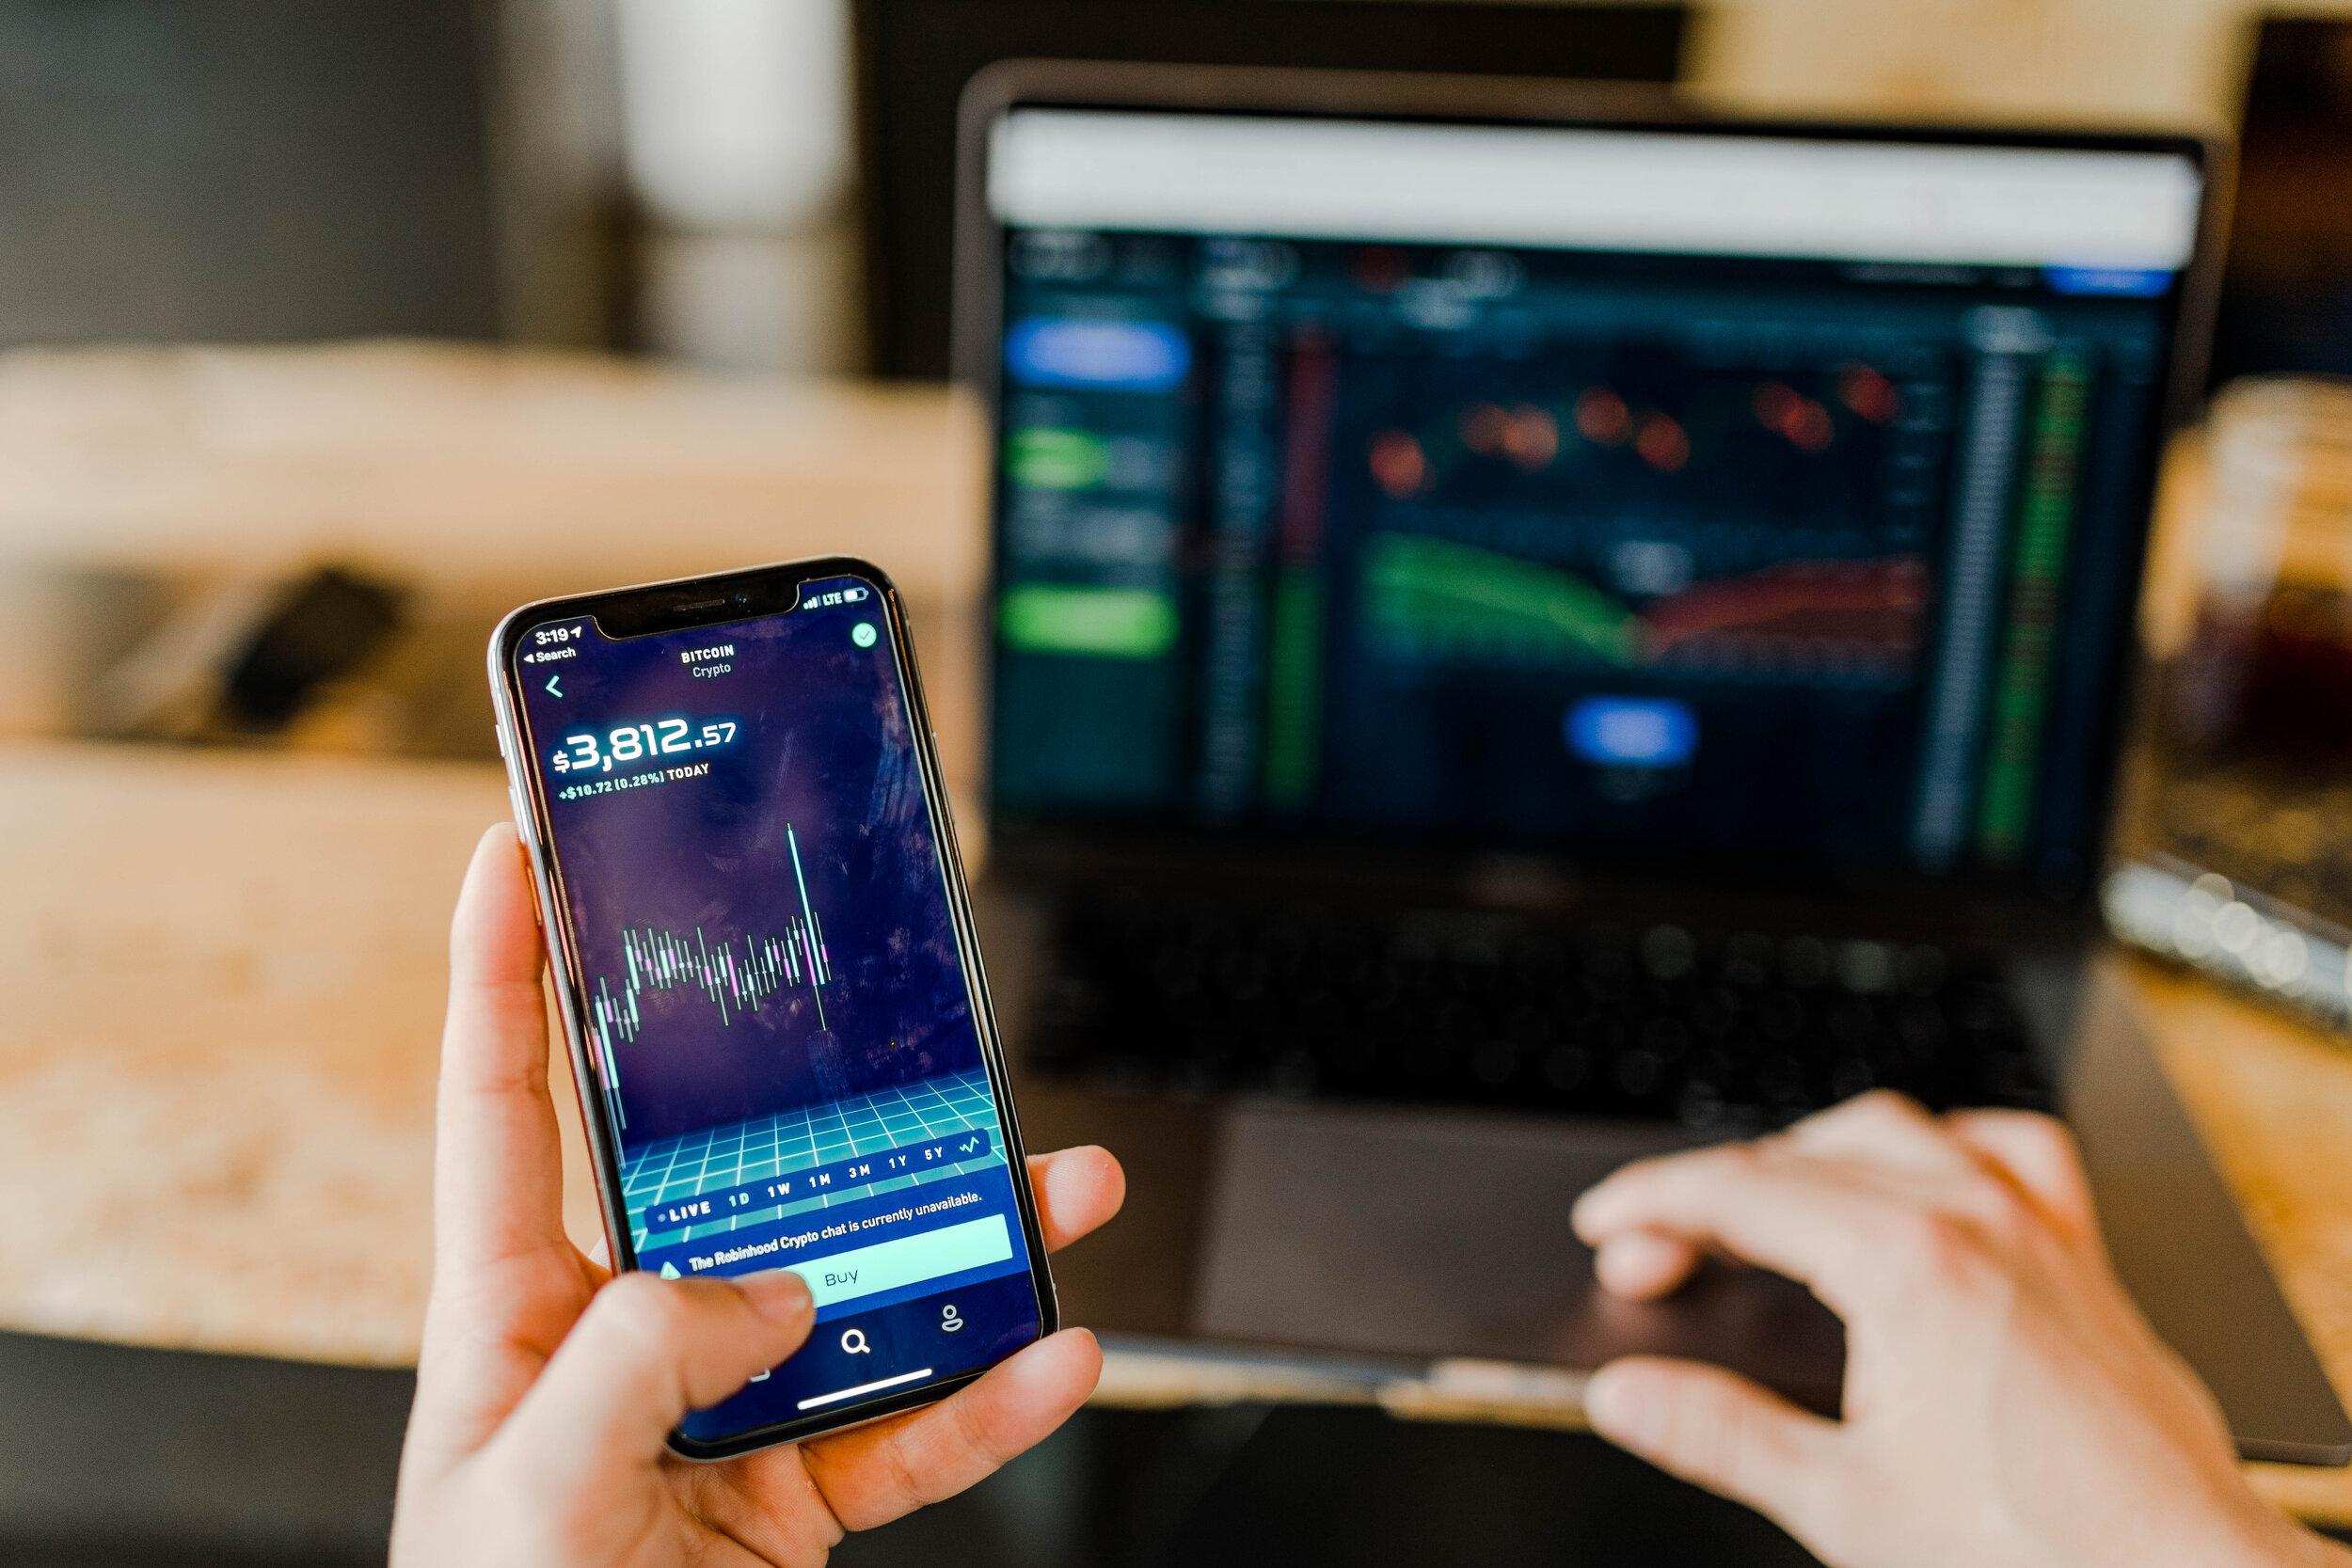 financial data on a smartphone screen